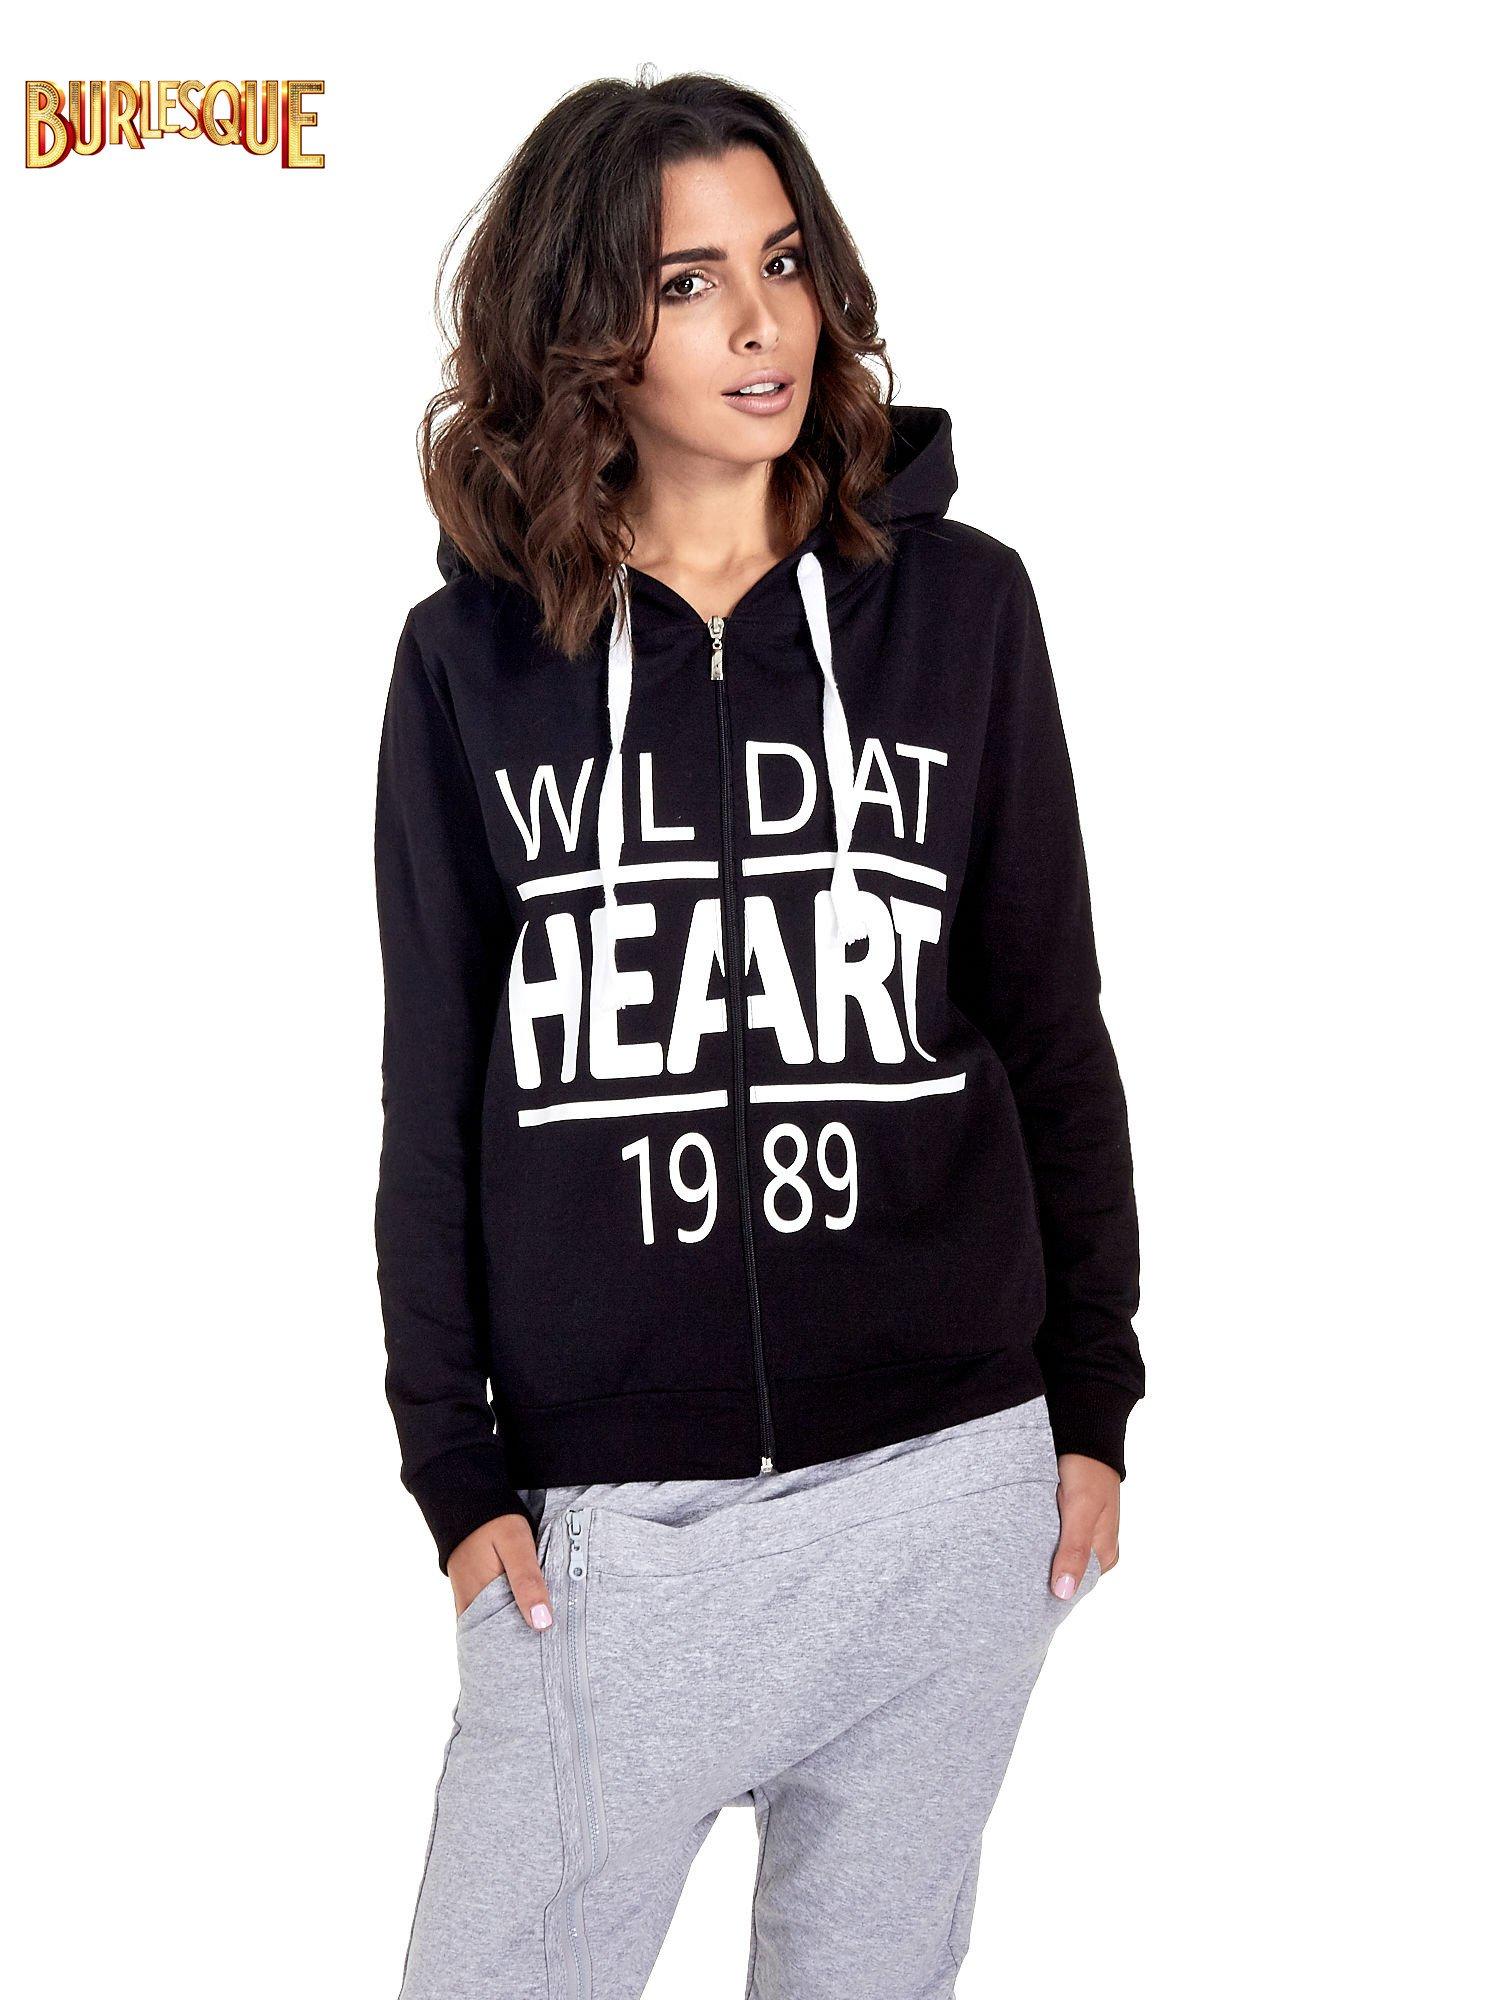 Czarna damska bluza z kapturem i napisem WILD AT HEART 1989                                  zdj.                                  1